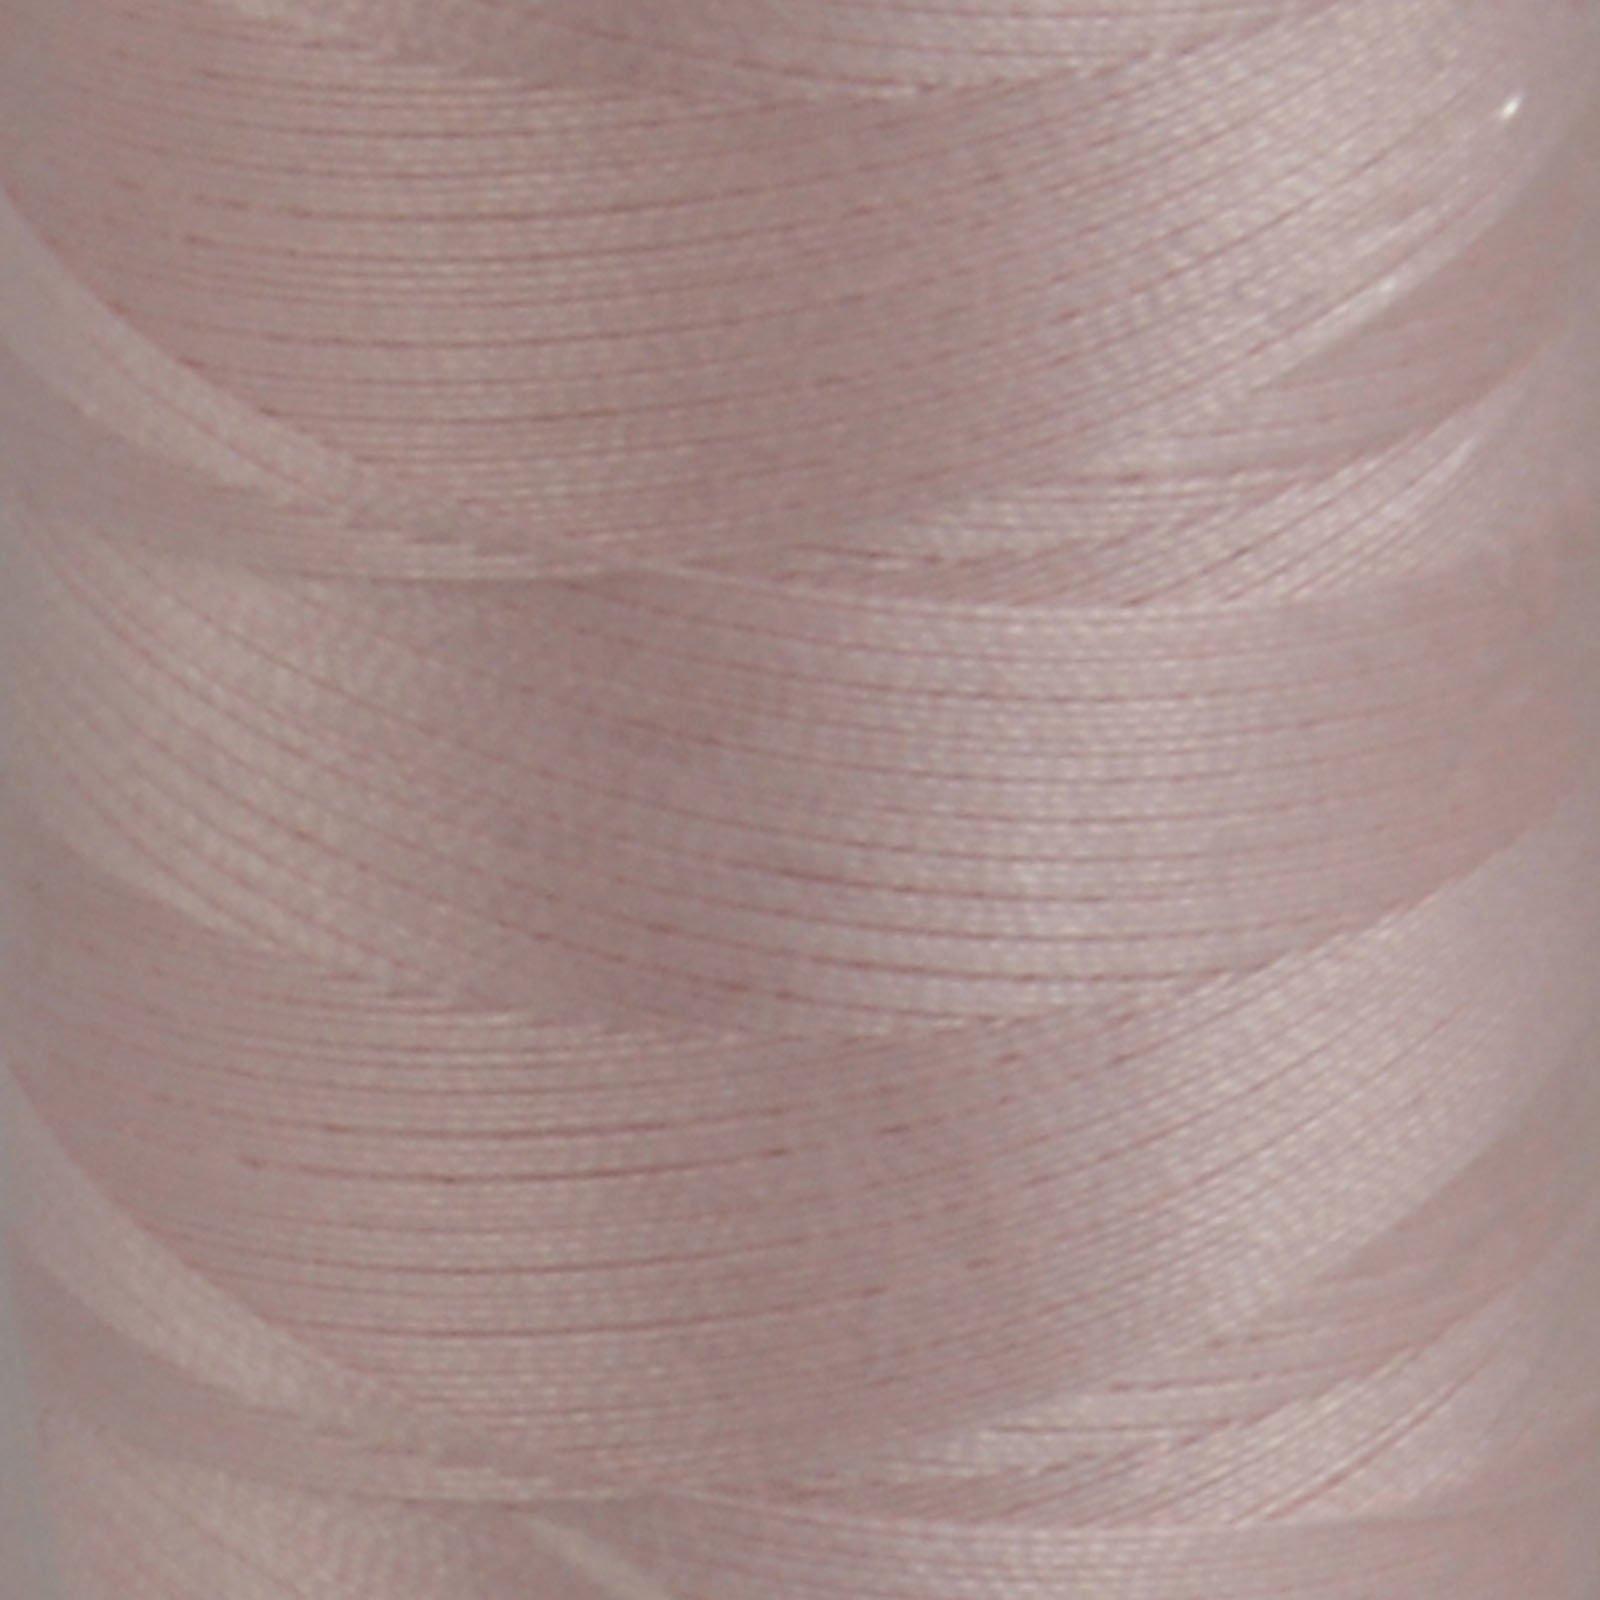 # 2410 Pale Pink